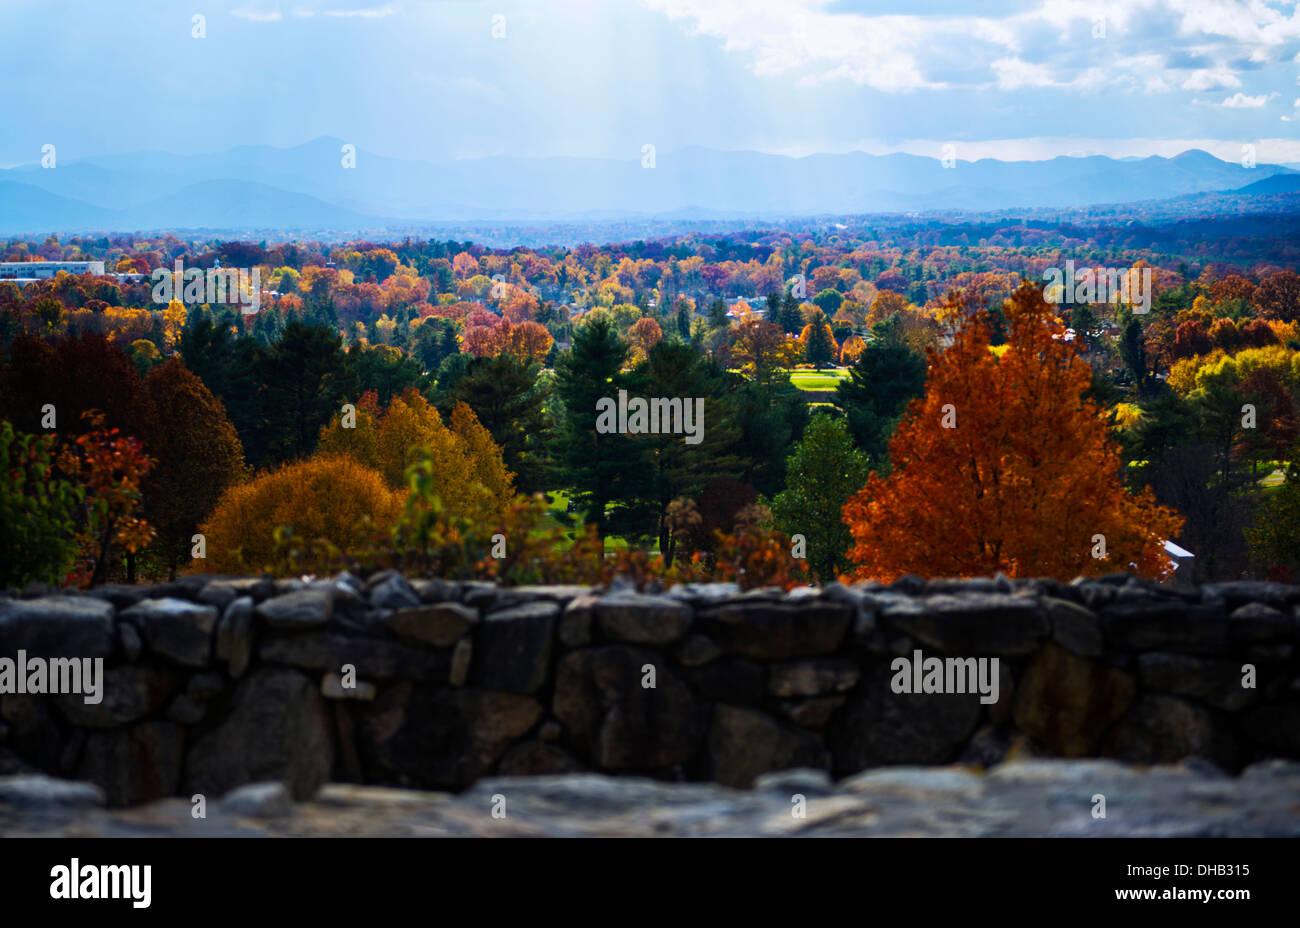 Autumn colors at the Grove Park Inn, Asheville North Carolina - Stock Image